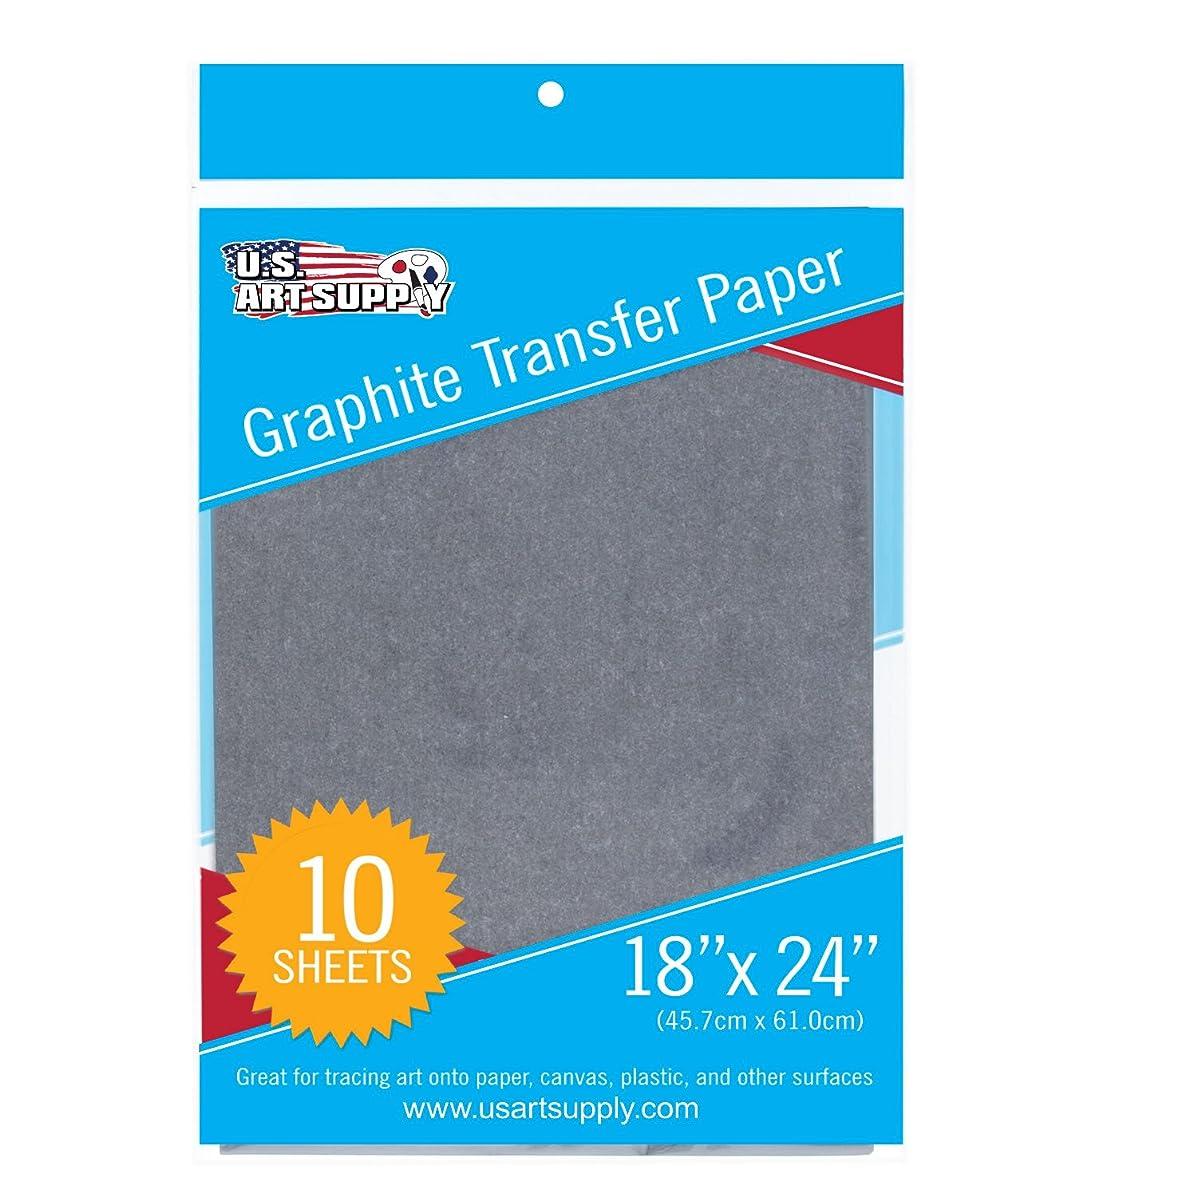 U.S. Art Supply Graphite Carbon Transfer Paper 18